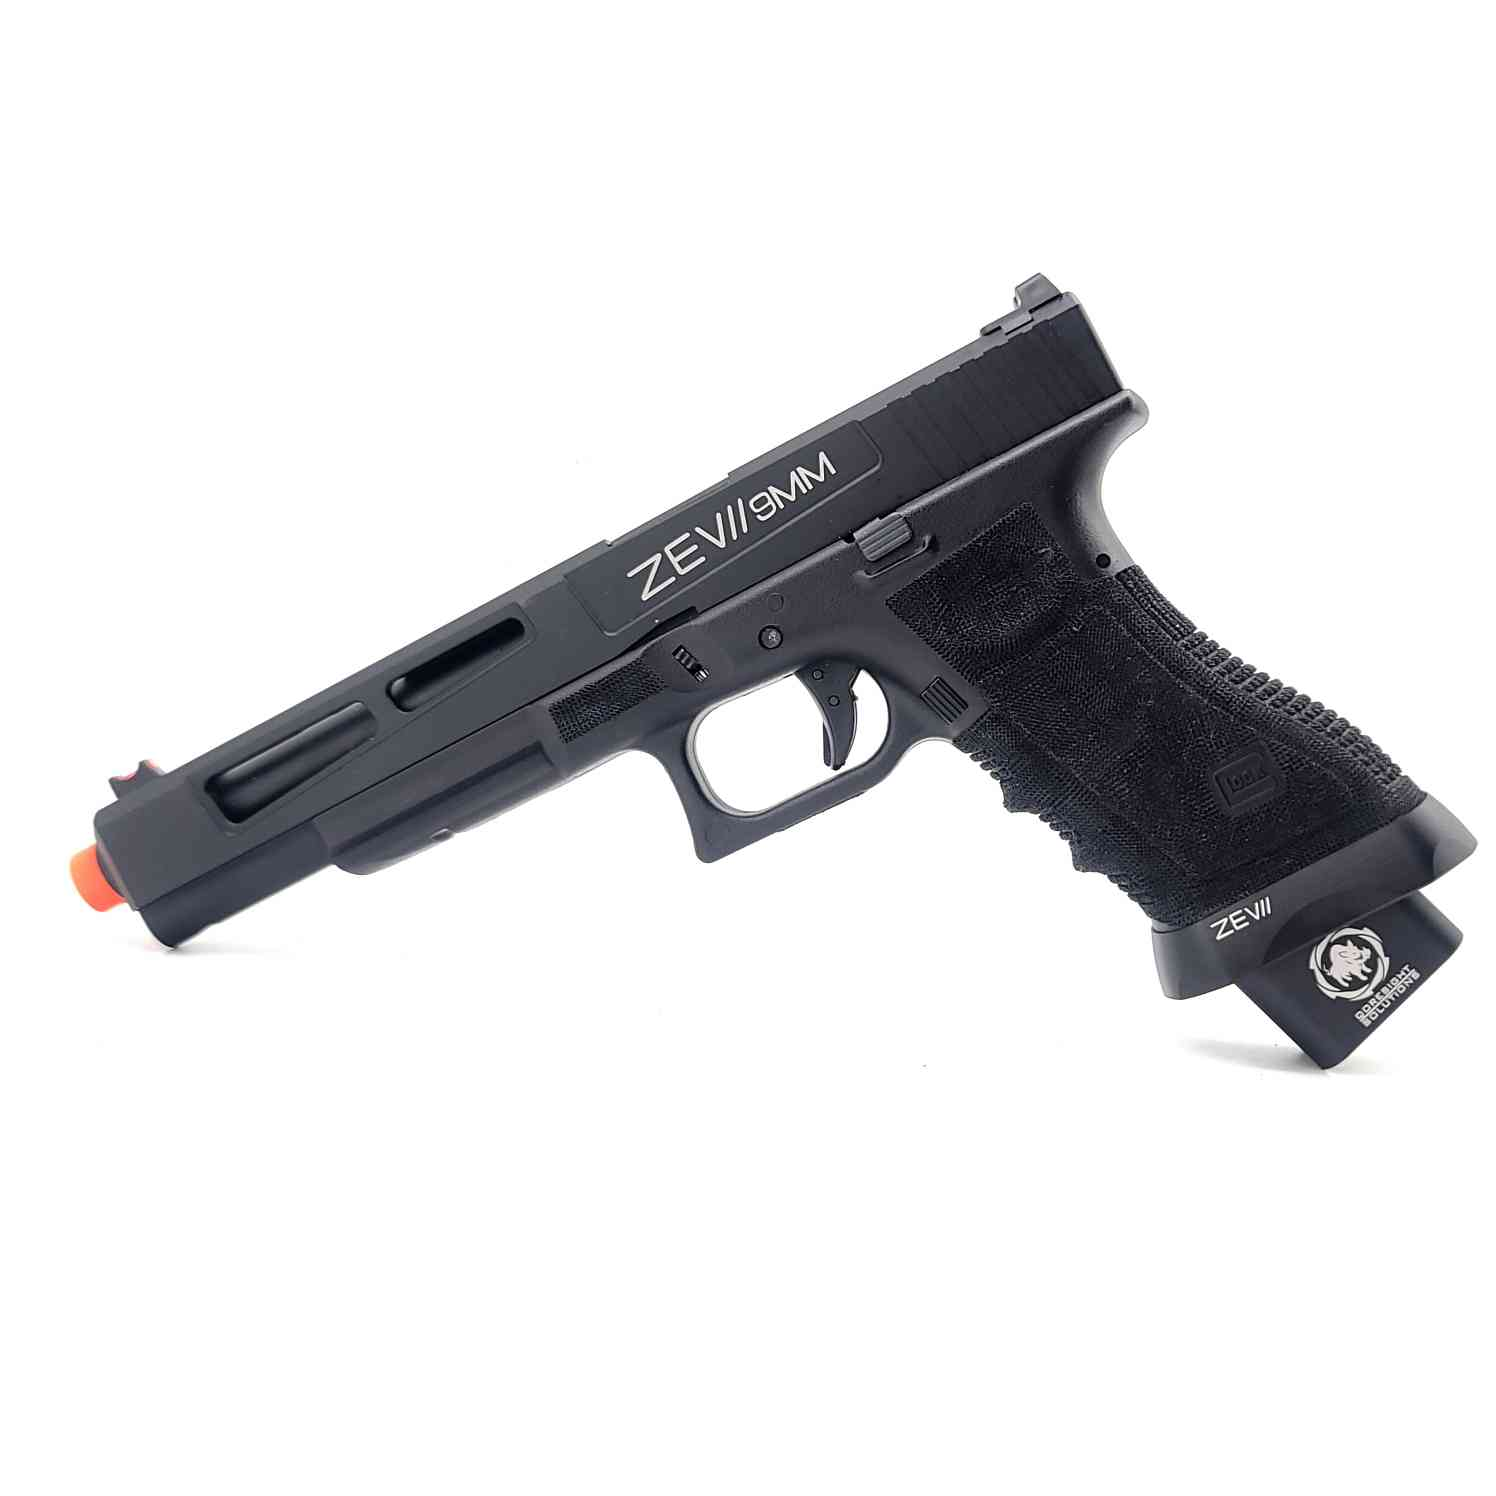 DOUBLE BELL Glock G17L ZEV II 9mm Combat Master Custom Gas Powered Gel Blaster [762]